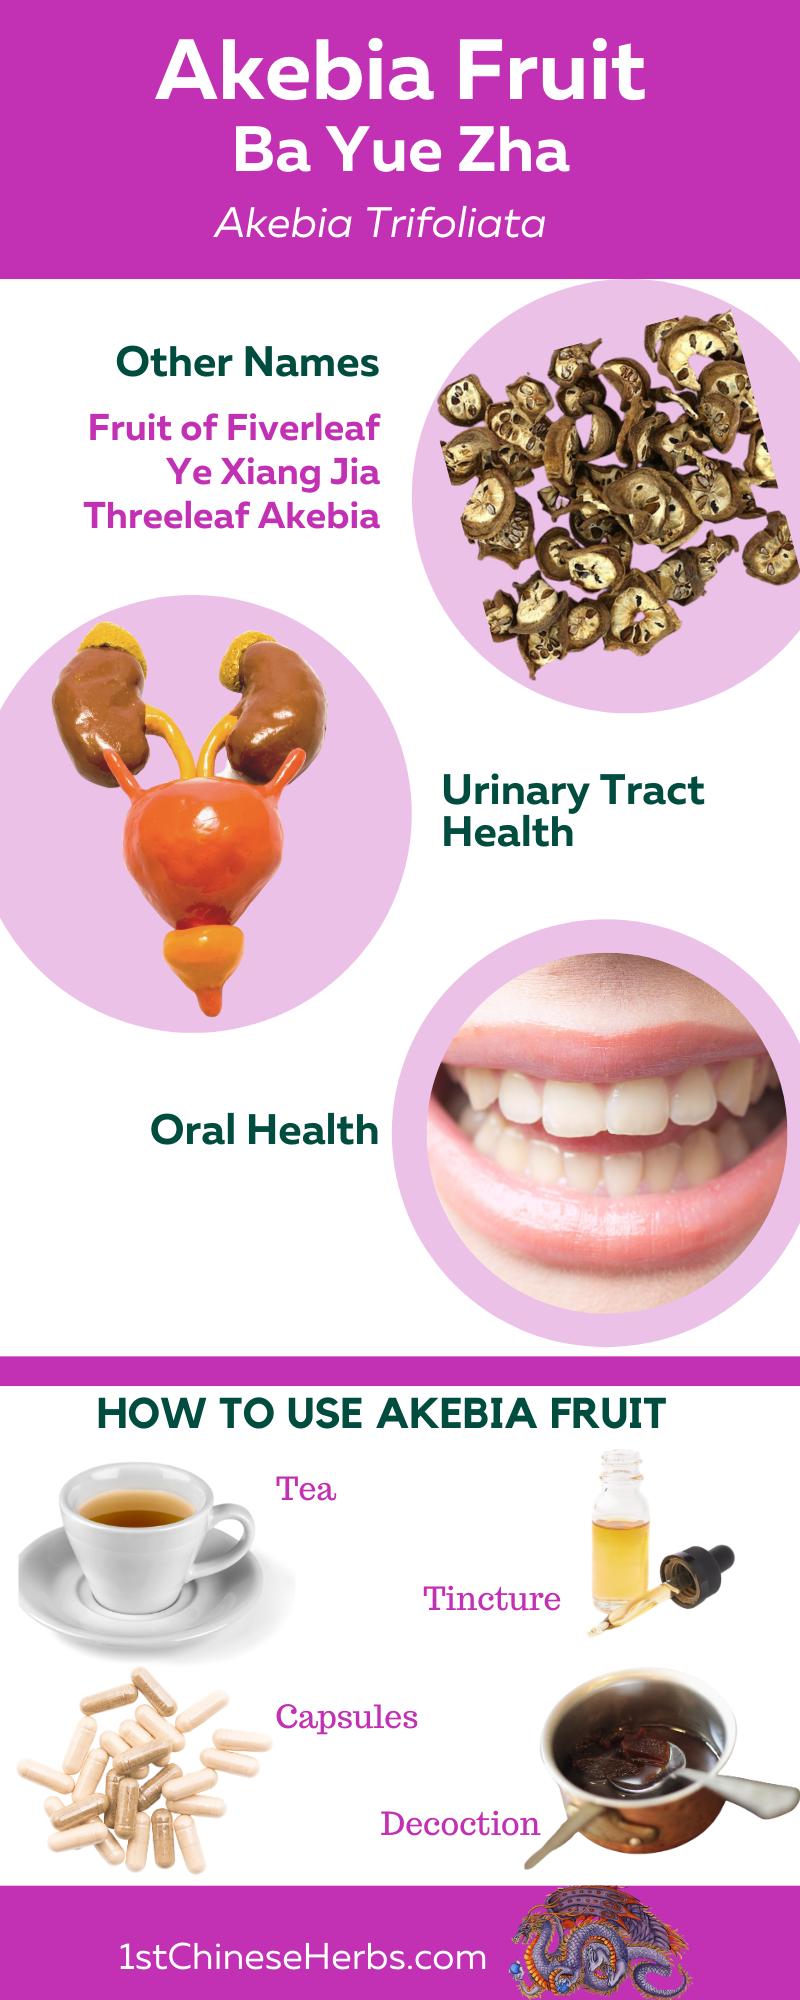 akebia fruit health benefits, akebia fruit edema, akebia fruit mouth health, akebia fruit oral health, akebia fruit pain relief, akebia fruit urination